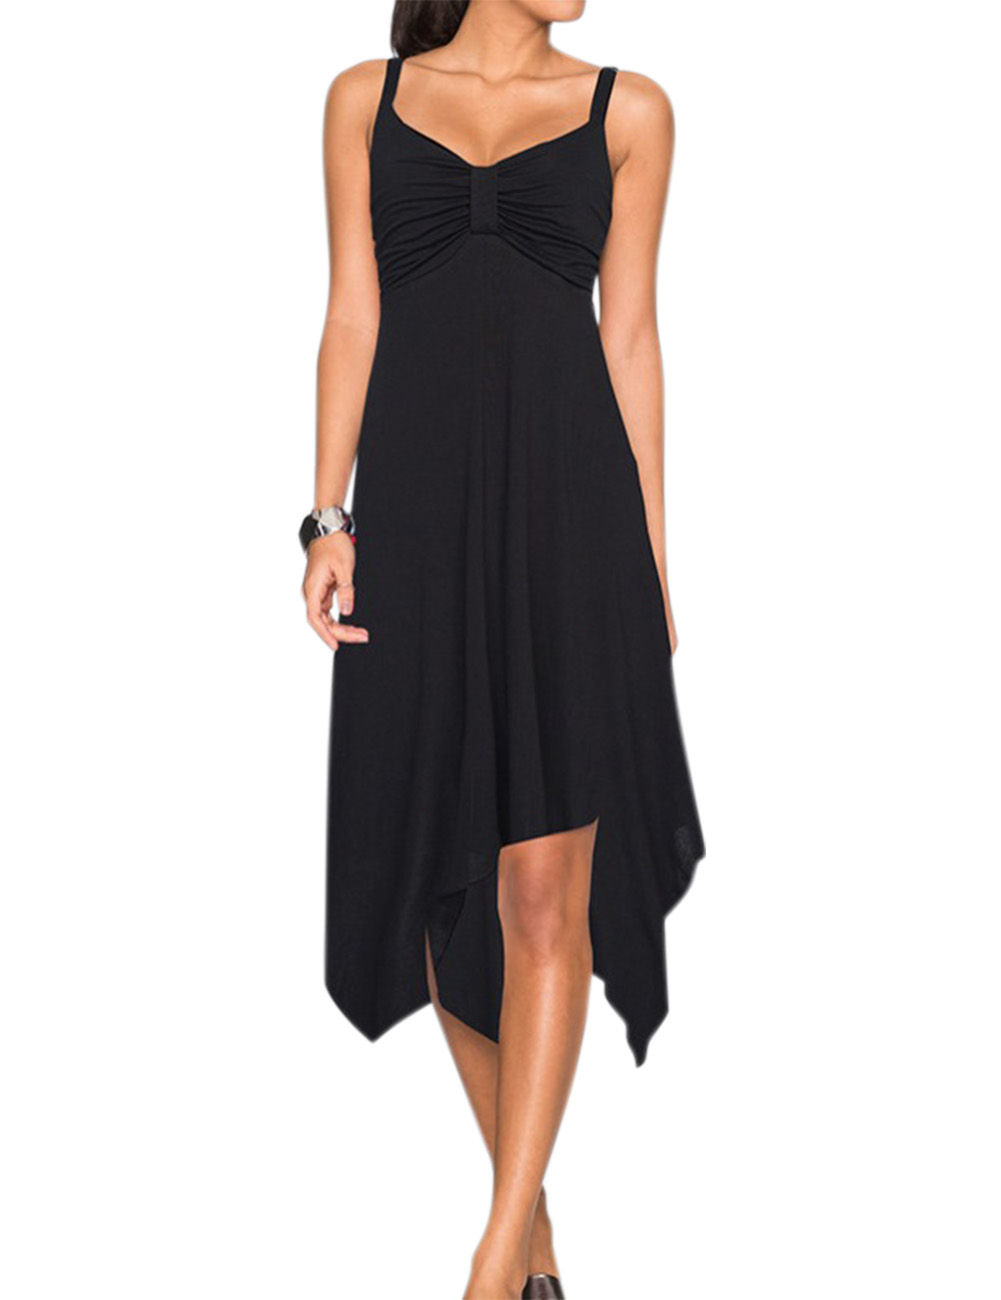 Liebeye Women's Casual Spaghetti Strap Ruched Asymmetrical A-line Sun Dress Black_M